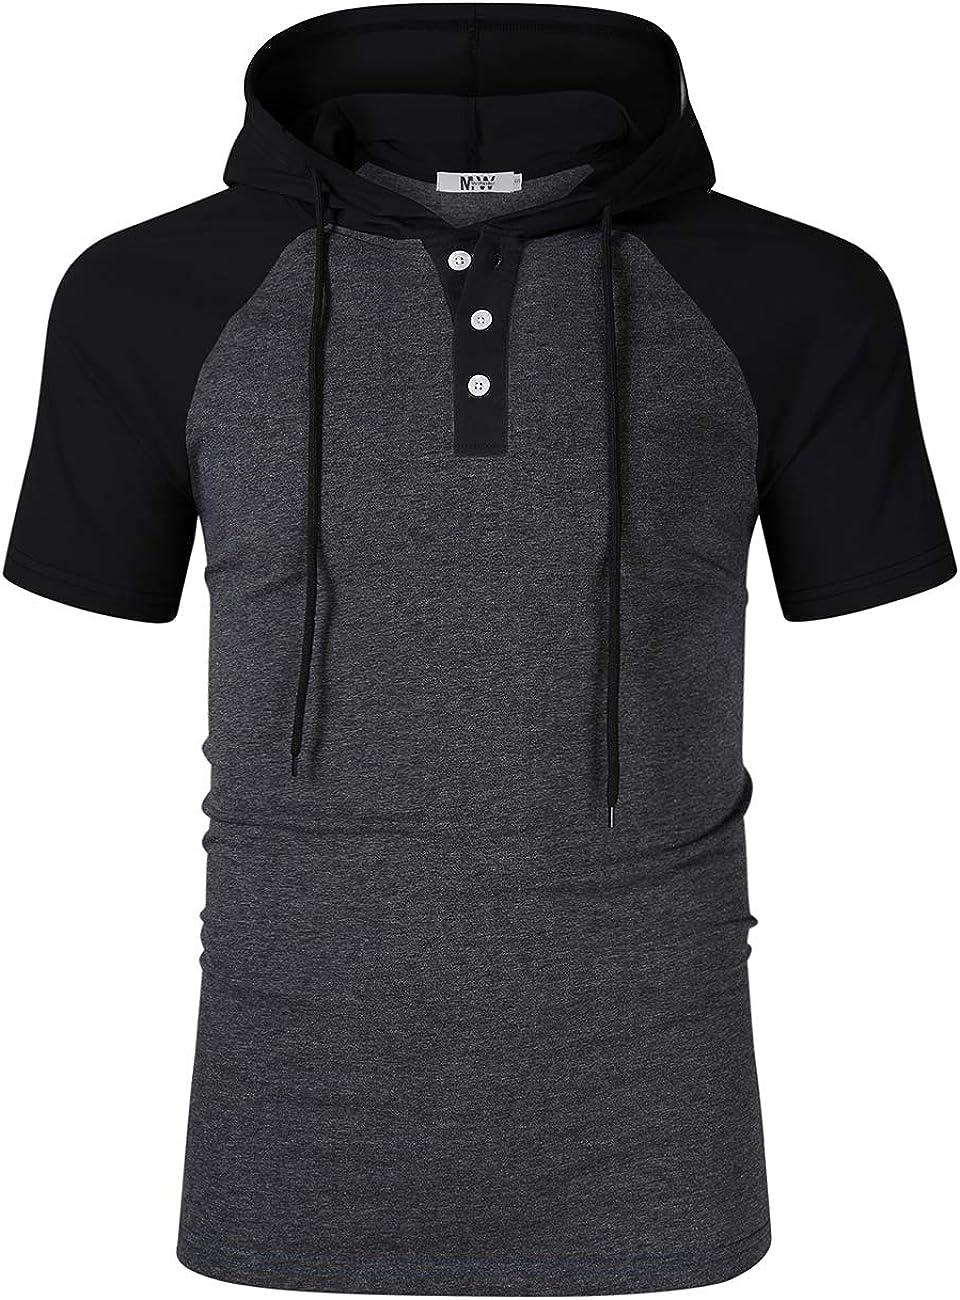 KUULEE Mens Slim Fit Hoodie Casual Hooded T-Shirt Henley Shirt for Men